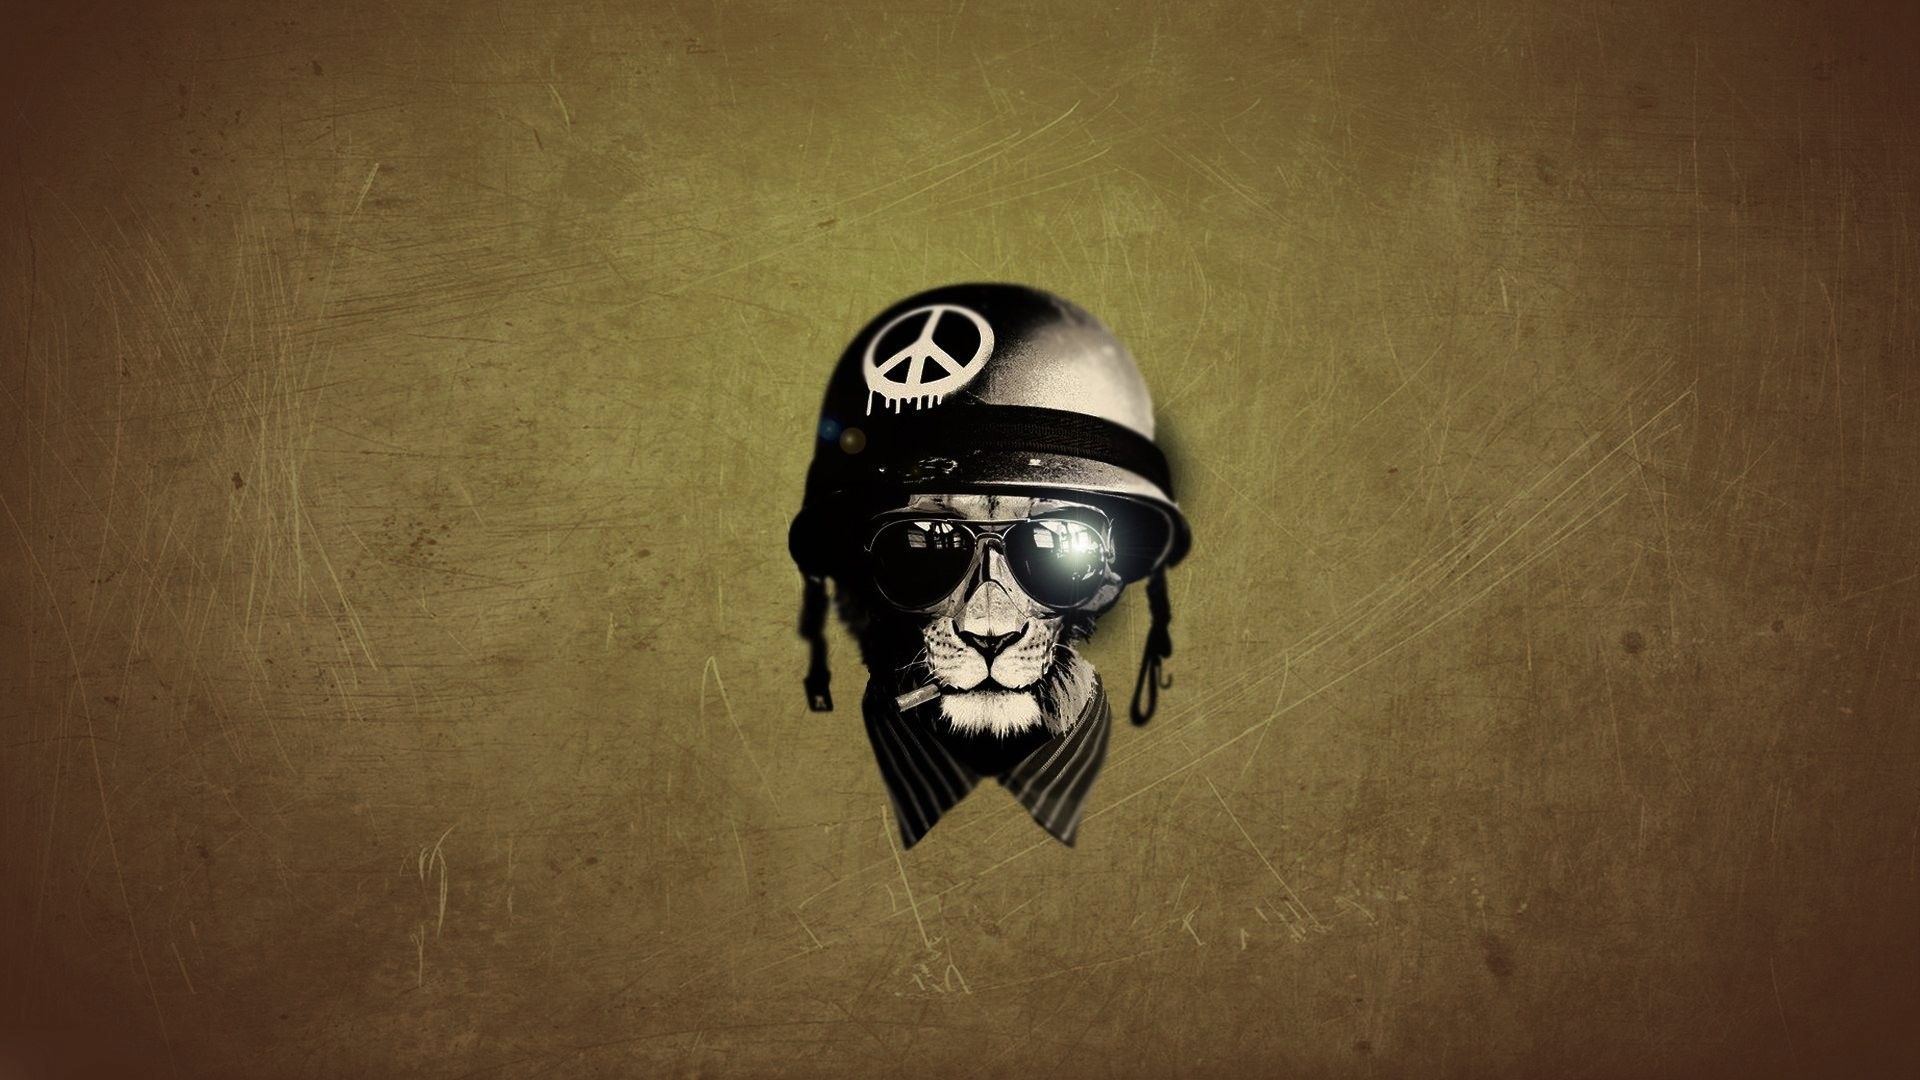 … hidden moves lion helmet leo hd wallpaper …